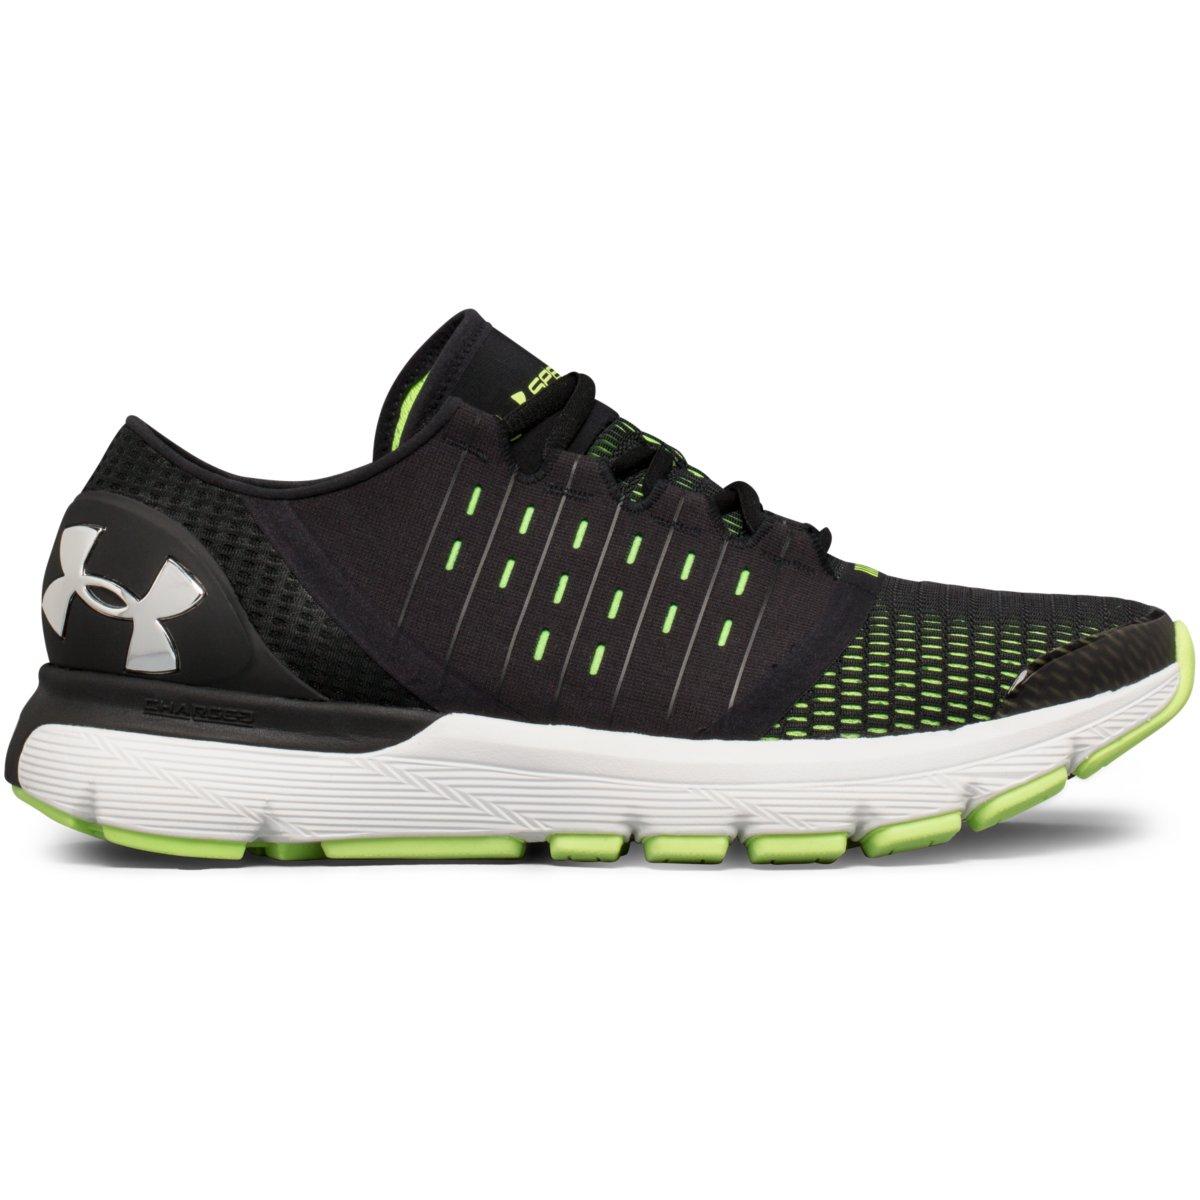 0c7cec81b4c1 ... Men s Under Armour Speedform Speedform Speedform Europa Running Shoe  Black Quirky Lime Chrome 61d1ab